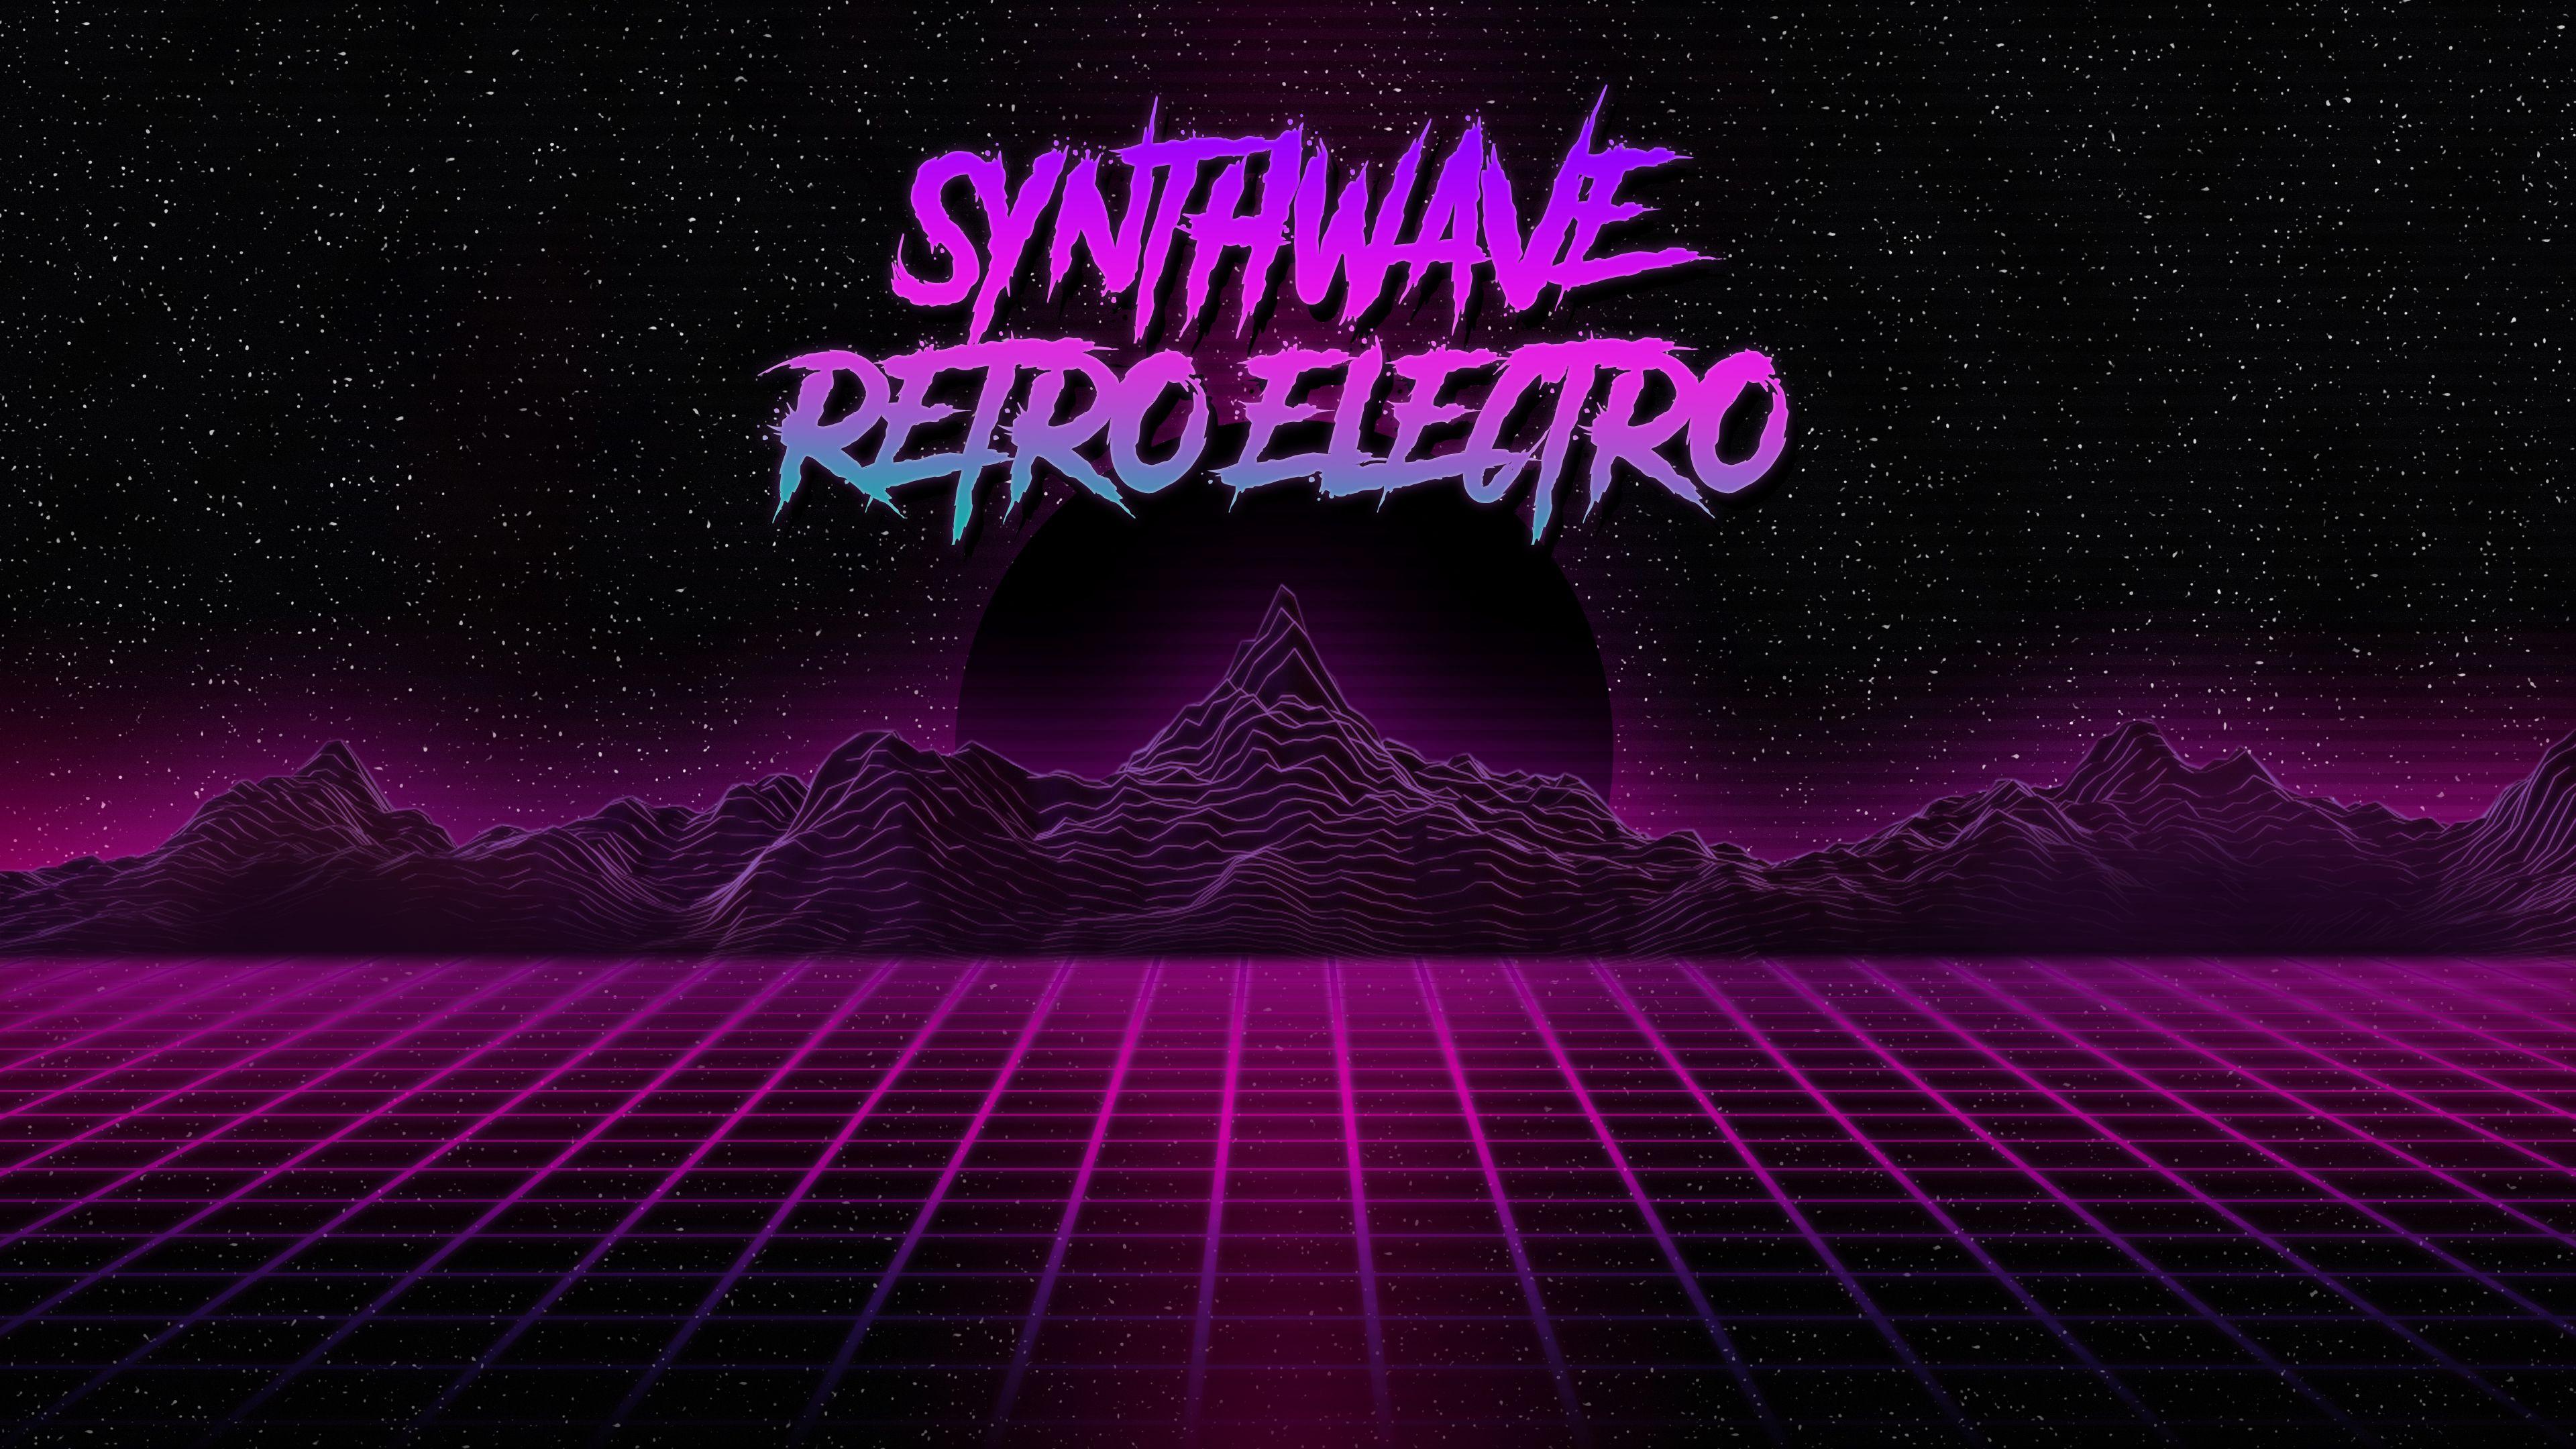 Synthwave Retro Electro Wallpaper [3840x2160] via Classy Bro 3840x2160